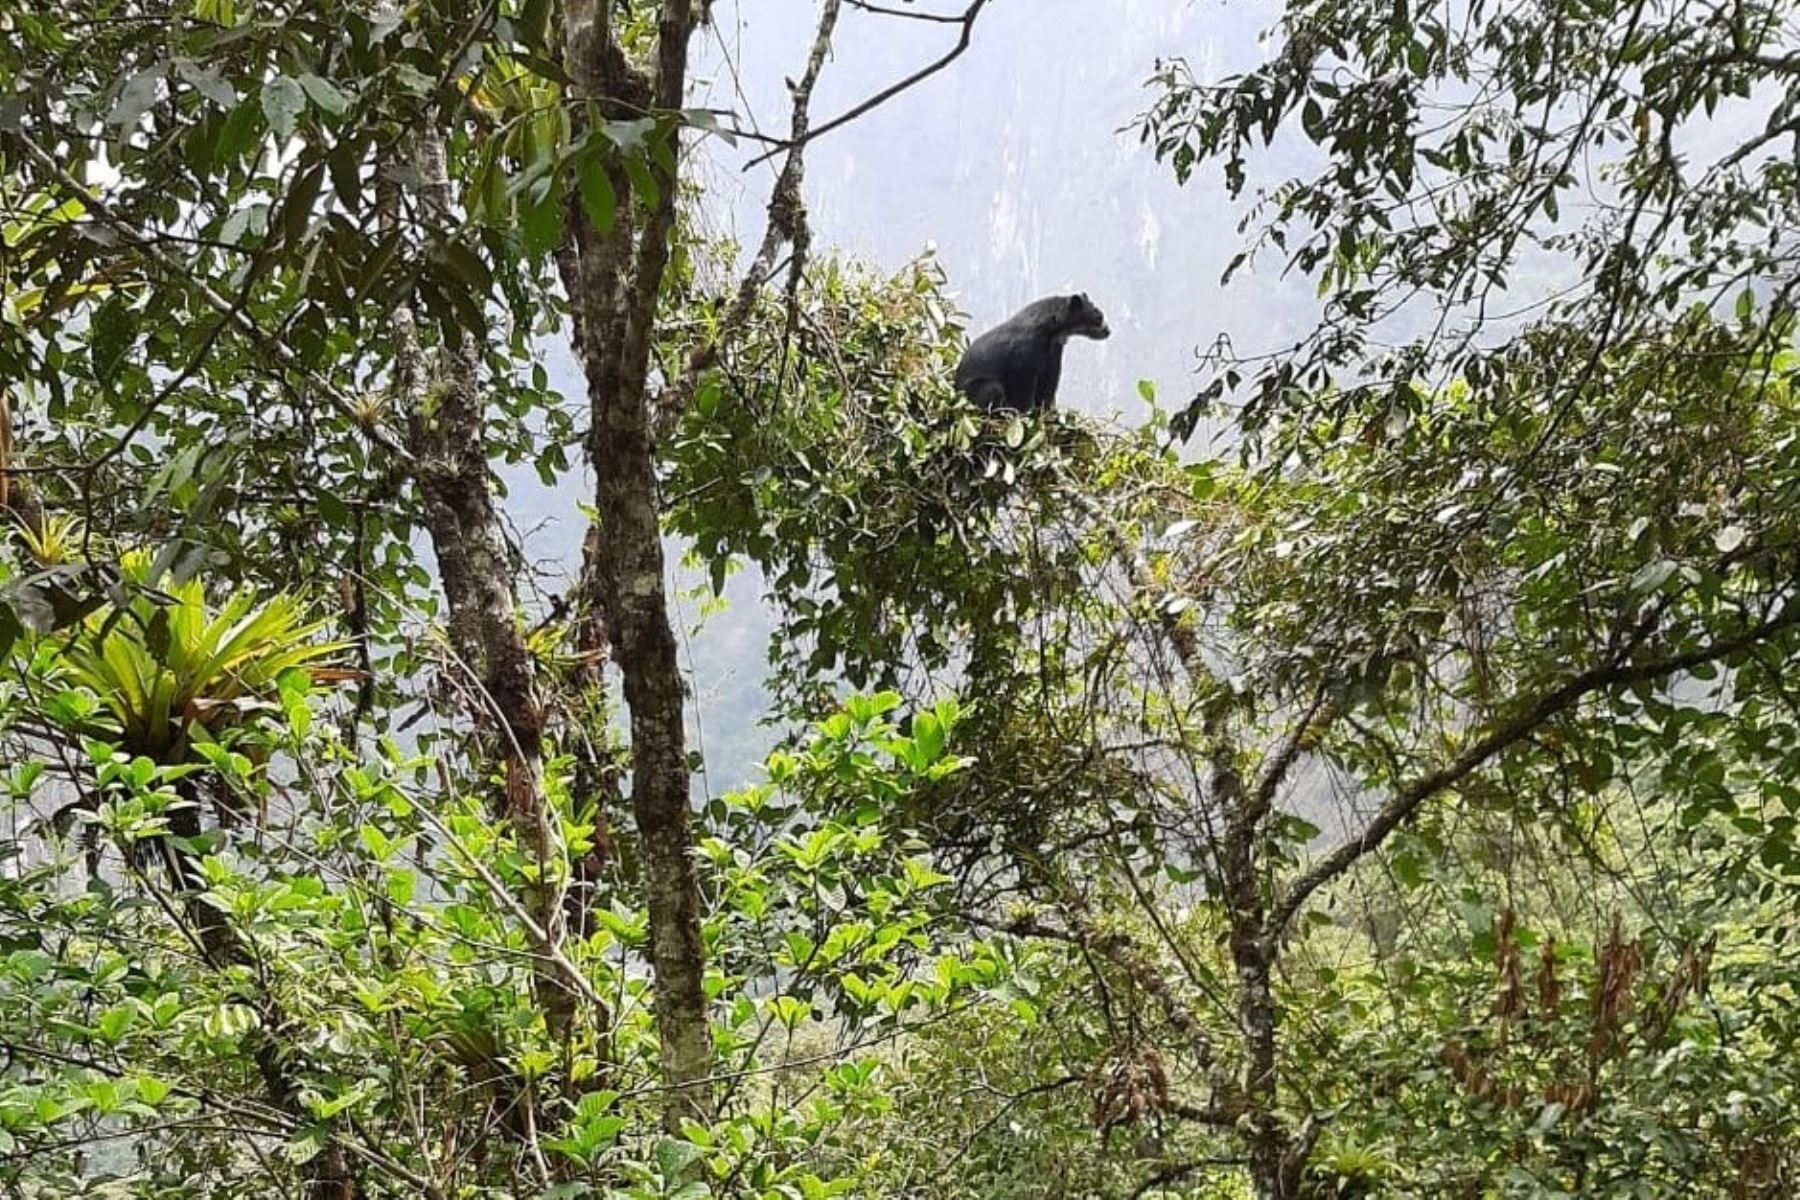 Spectacled bear seen near Machu Picchu.